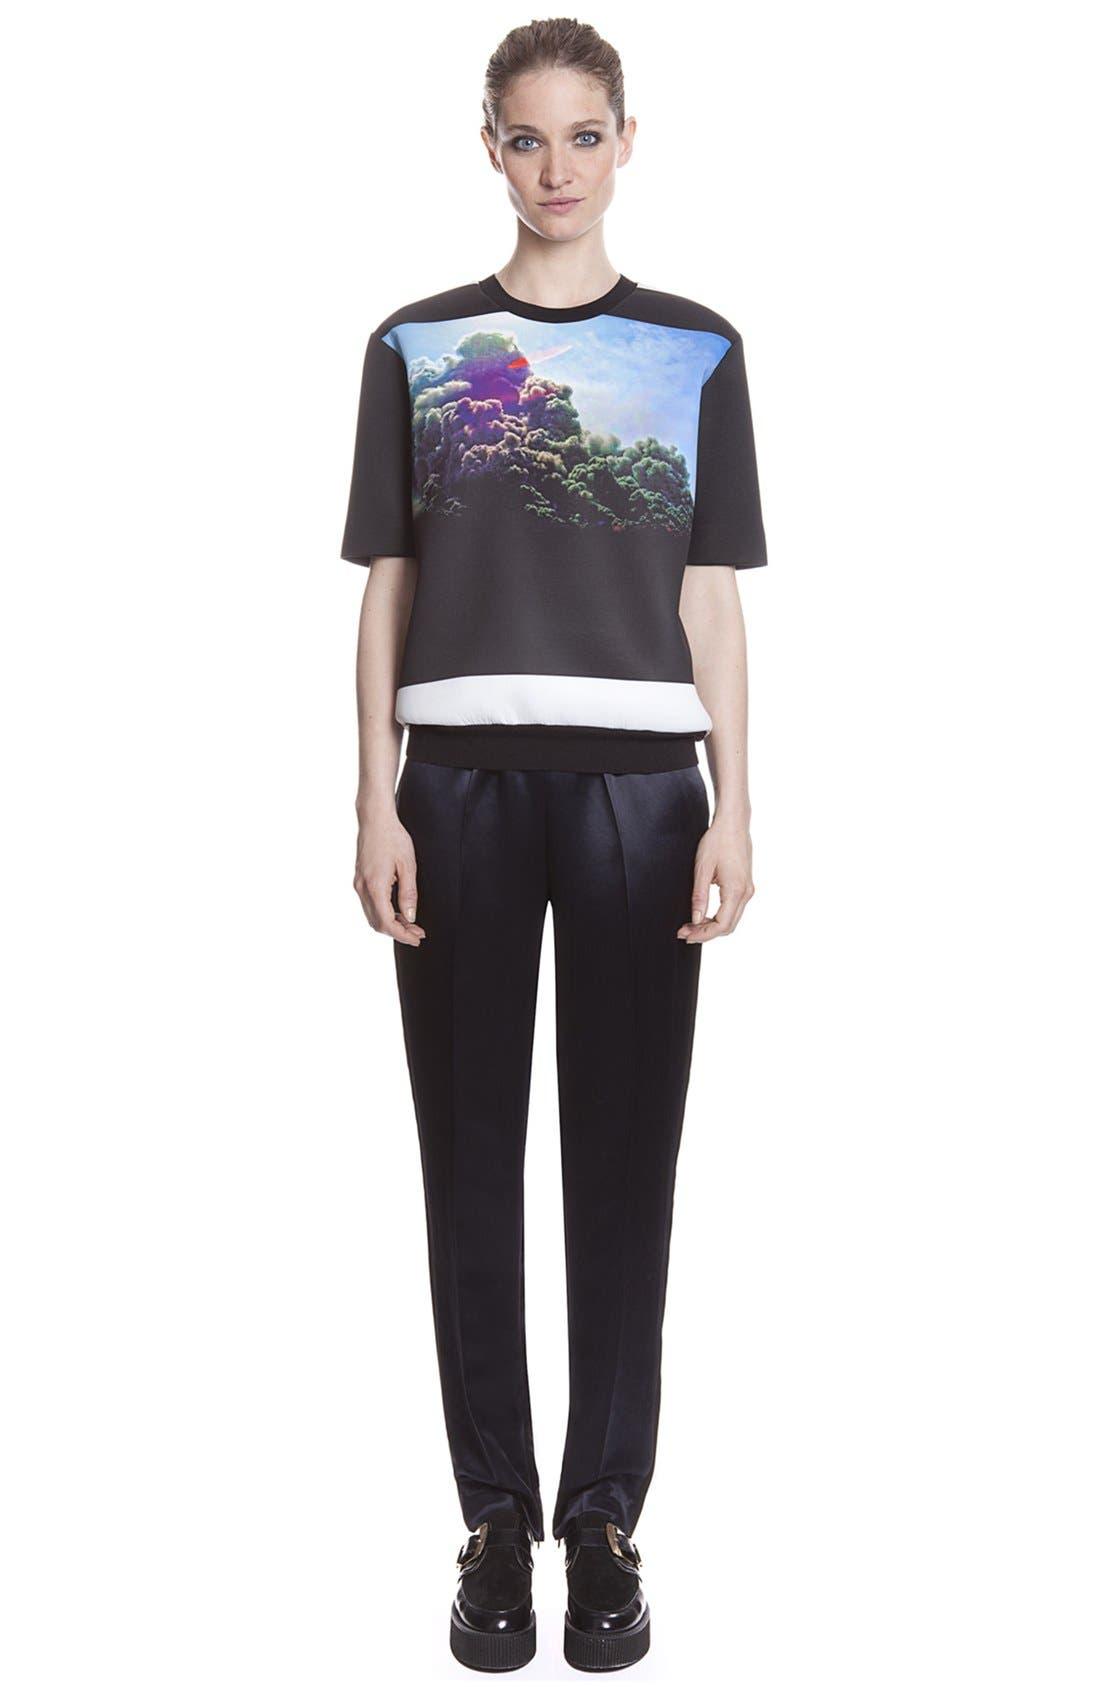 Alternate Image 1 Selected - sandro 'Pirouette' Tuxedo Stripe Satin Pants